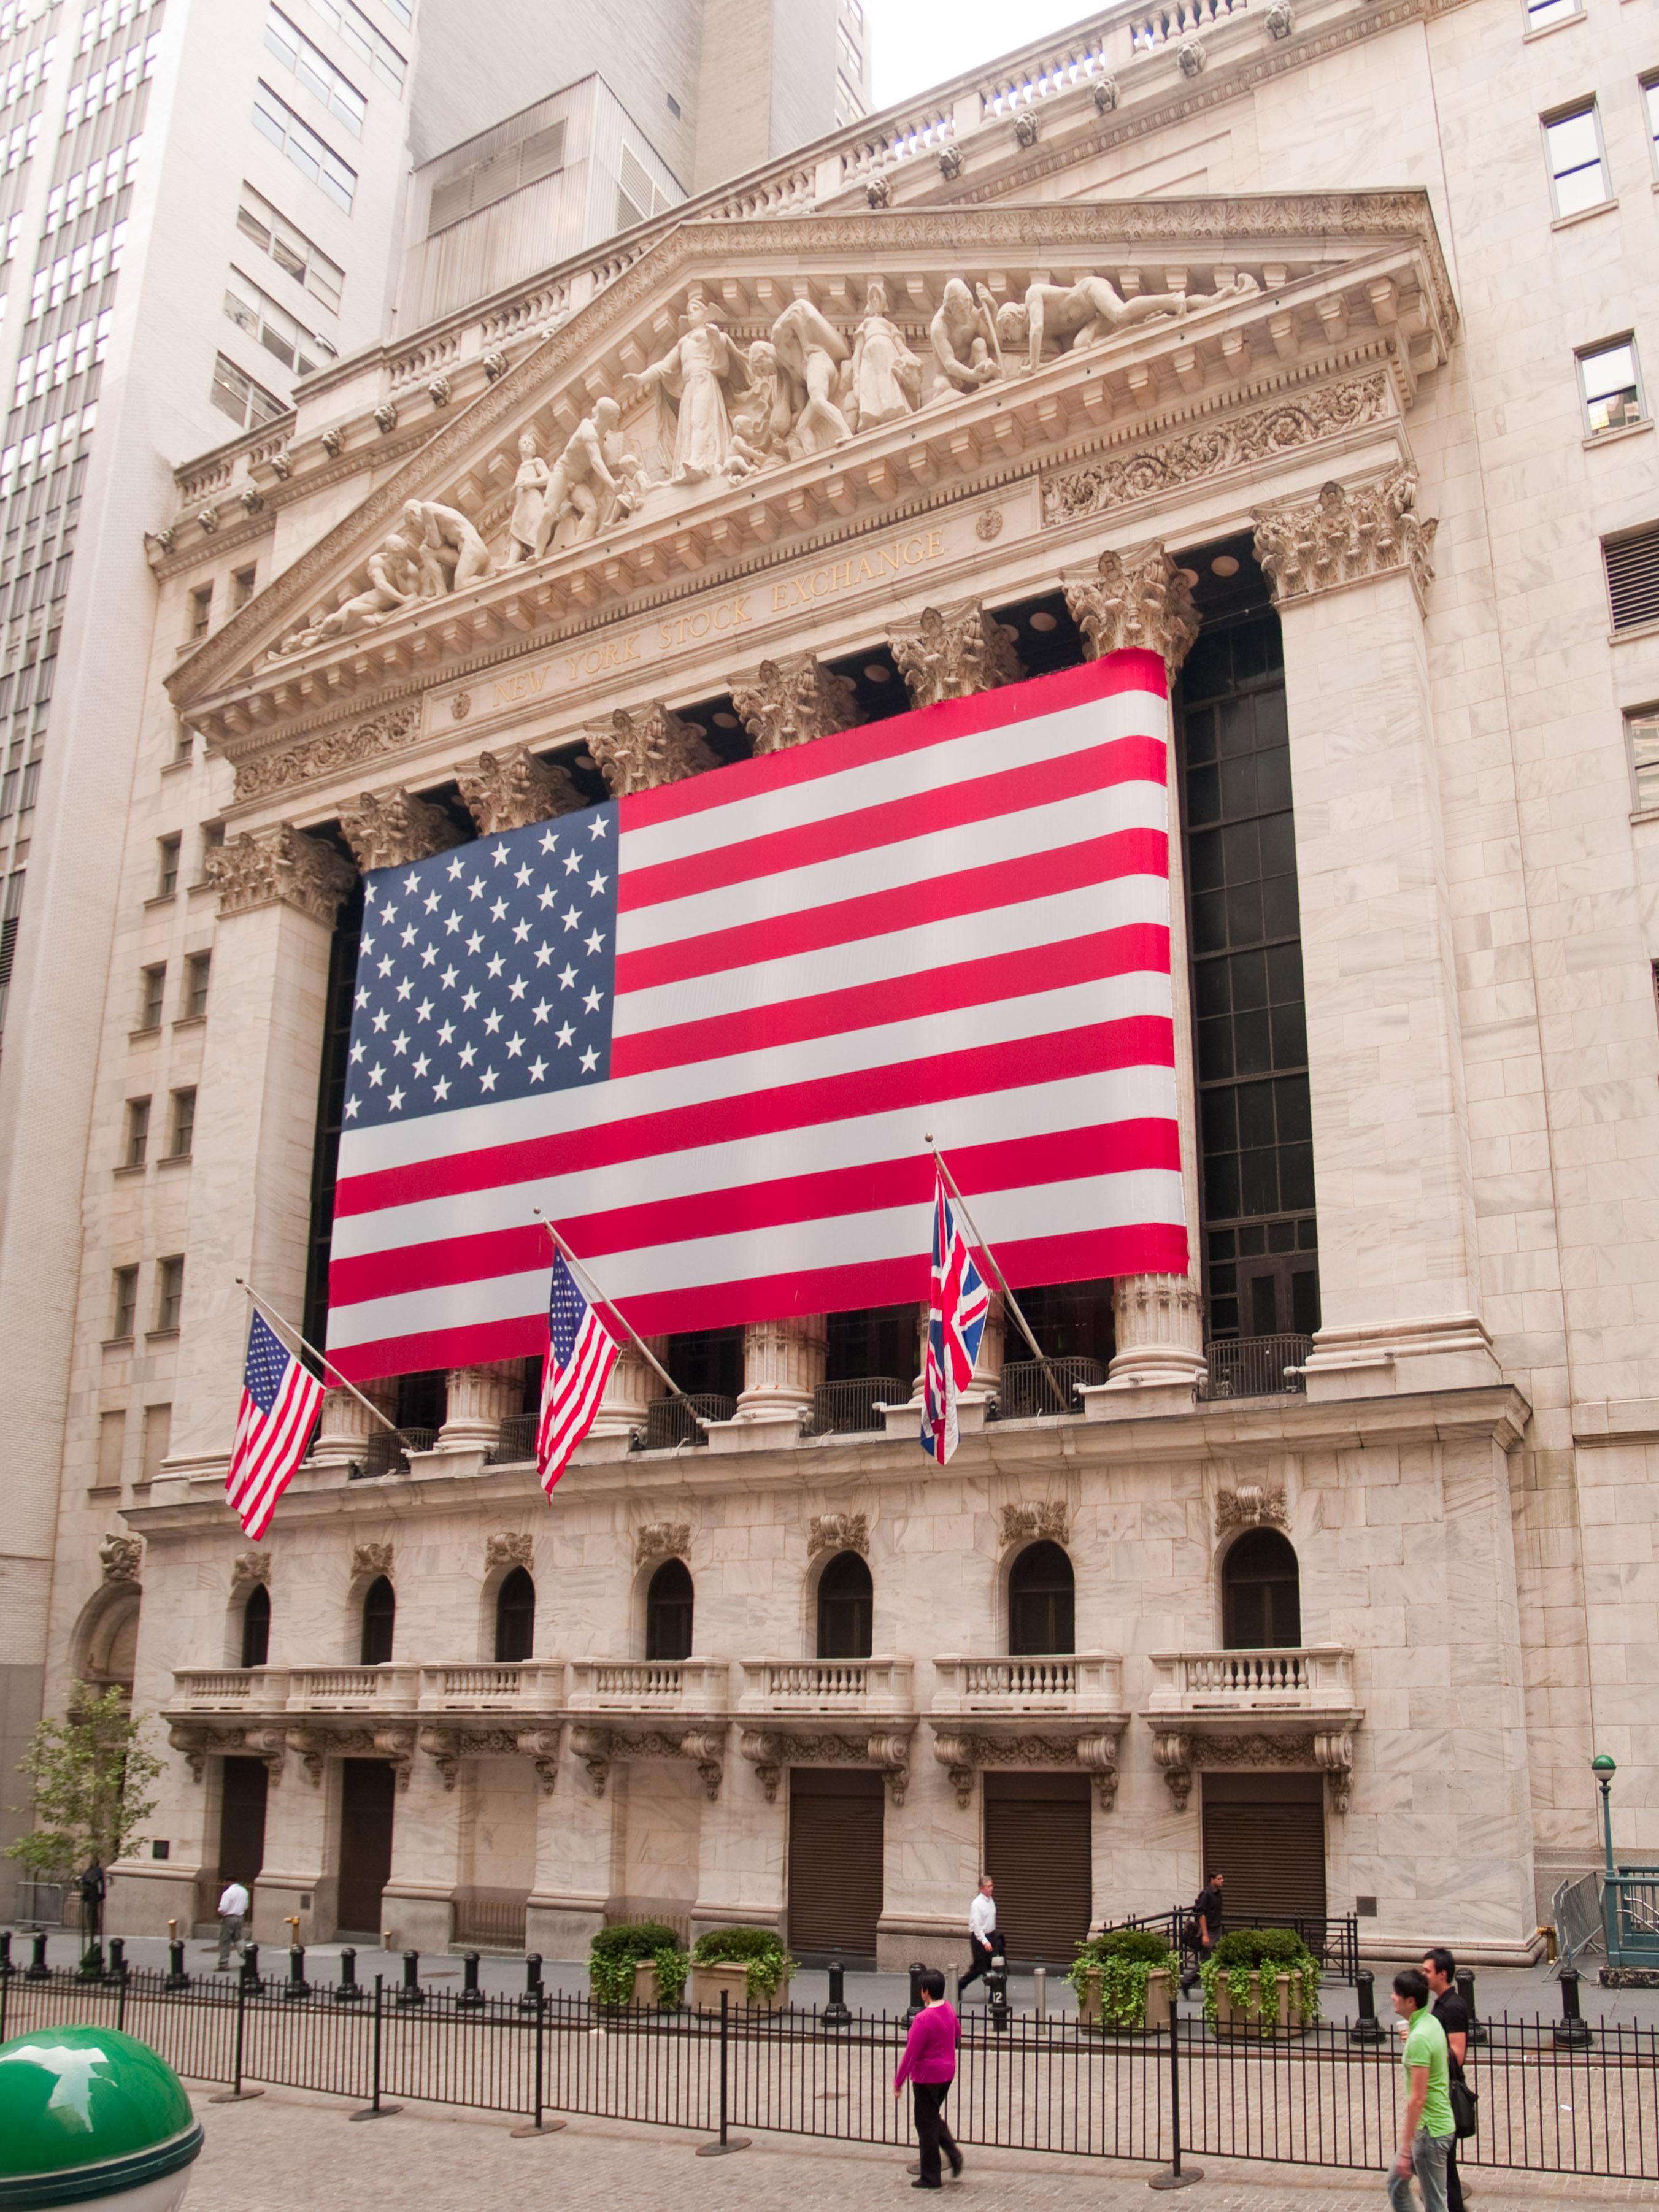 The New York Stock